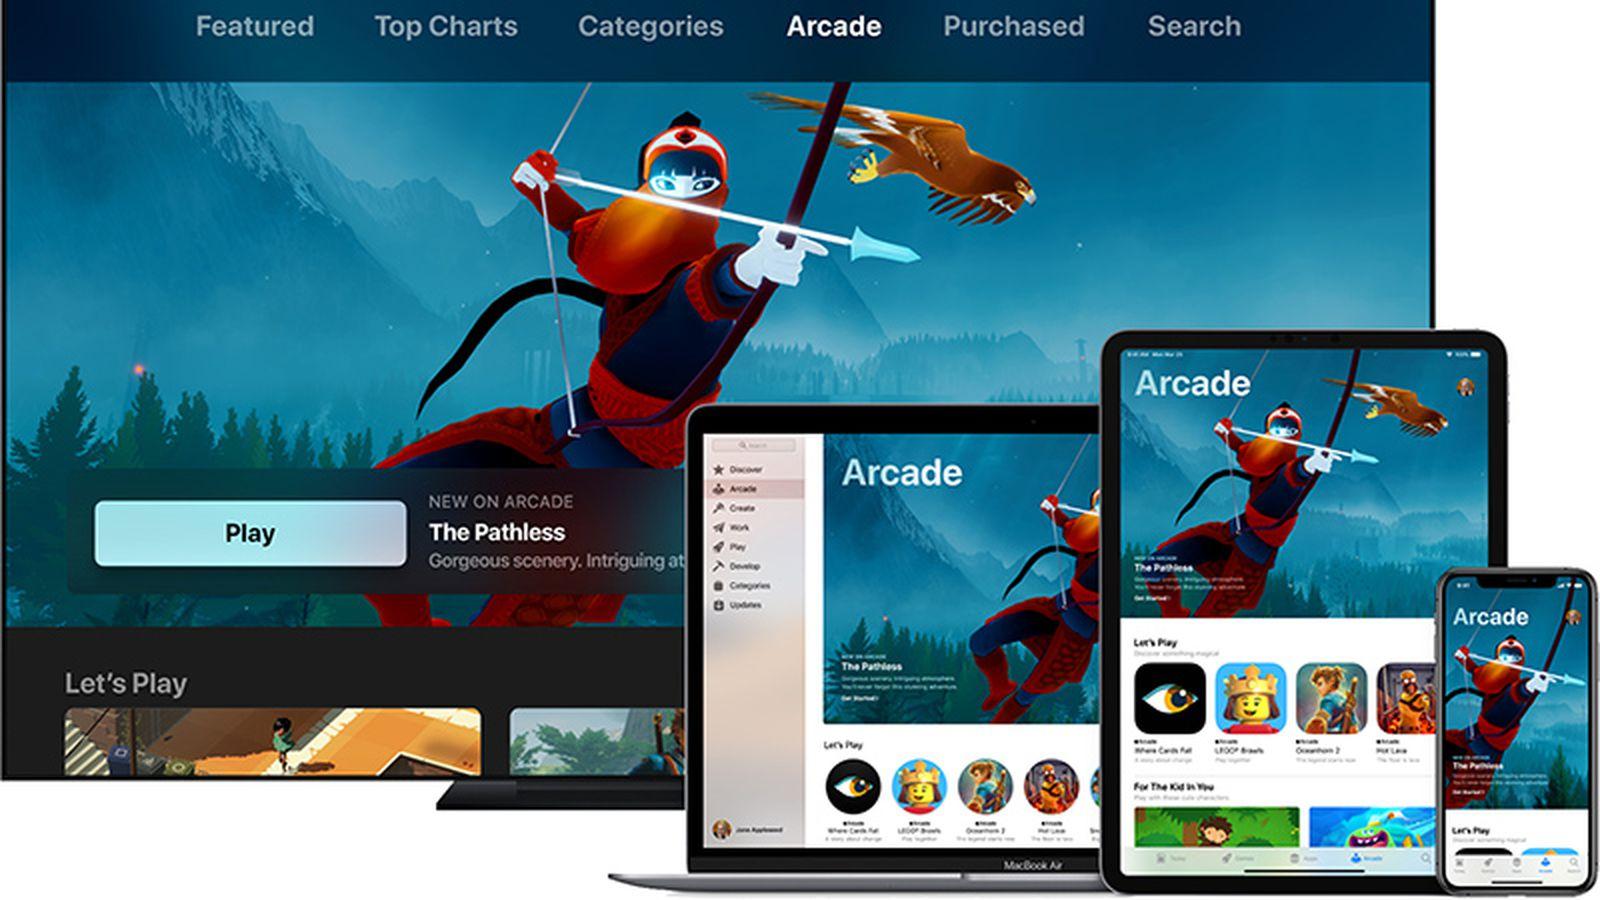 Robloxian Highschool Twitterissa It S Finally Winter Explore Apple Arcade The Complete Guide Macrumors